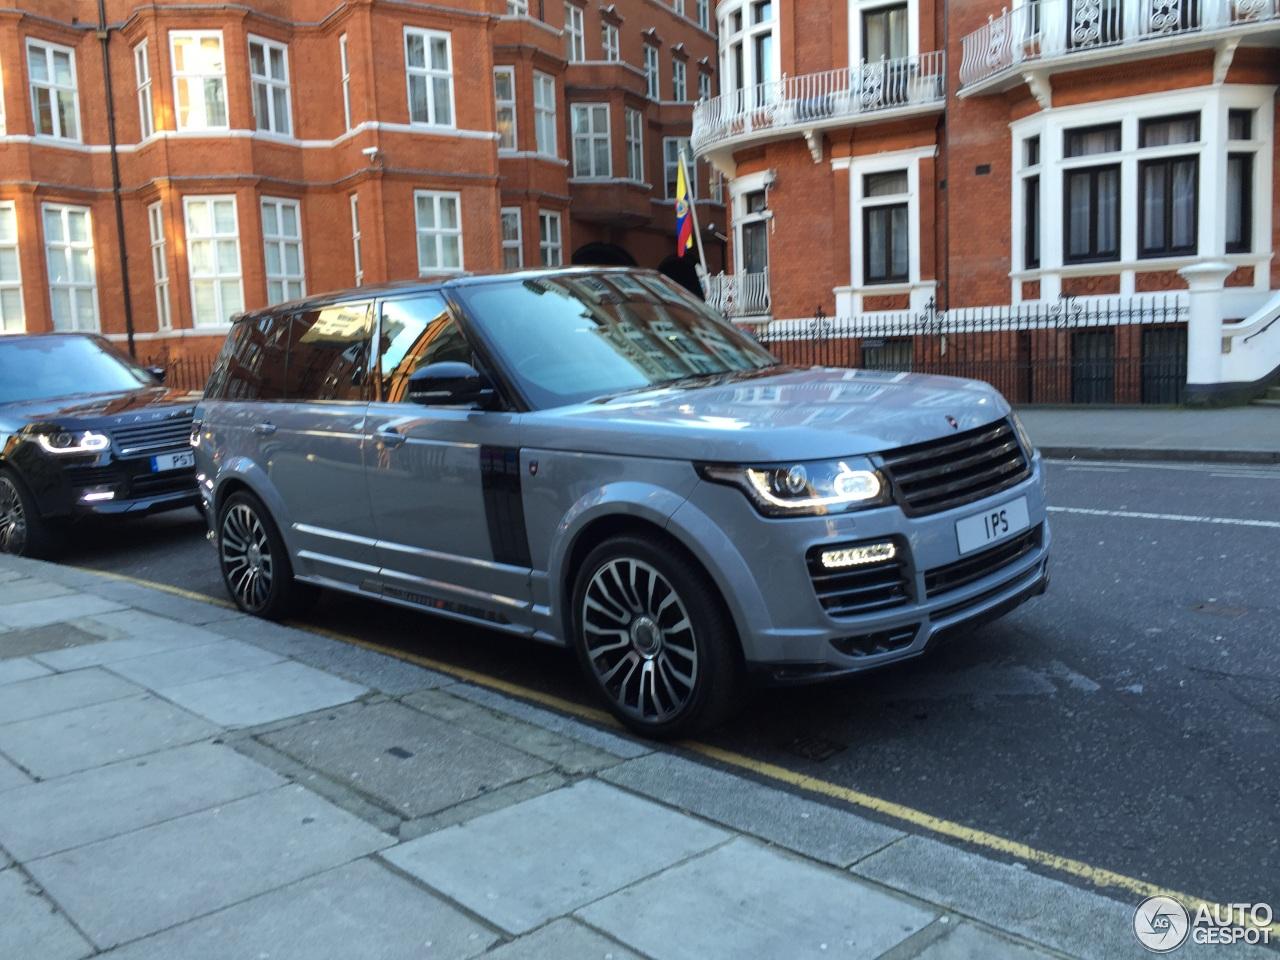 Range Rover Onyx >> Land Rover Mansory Range Rover Autobiography LWB 2013 - 18 February 2015 - Autogespot